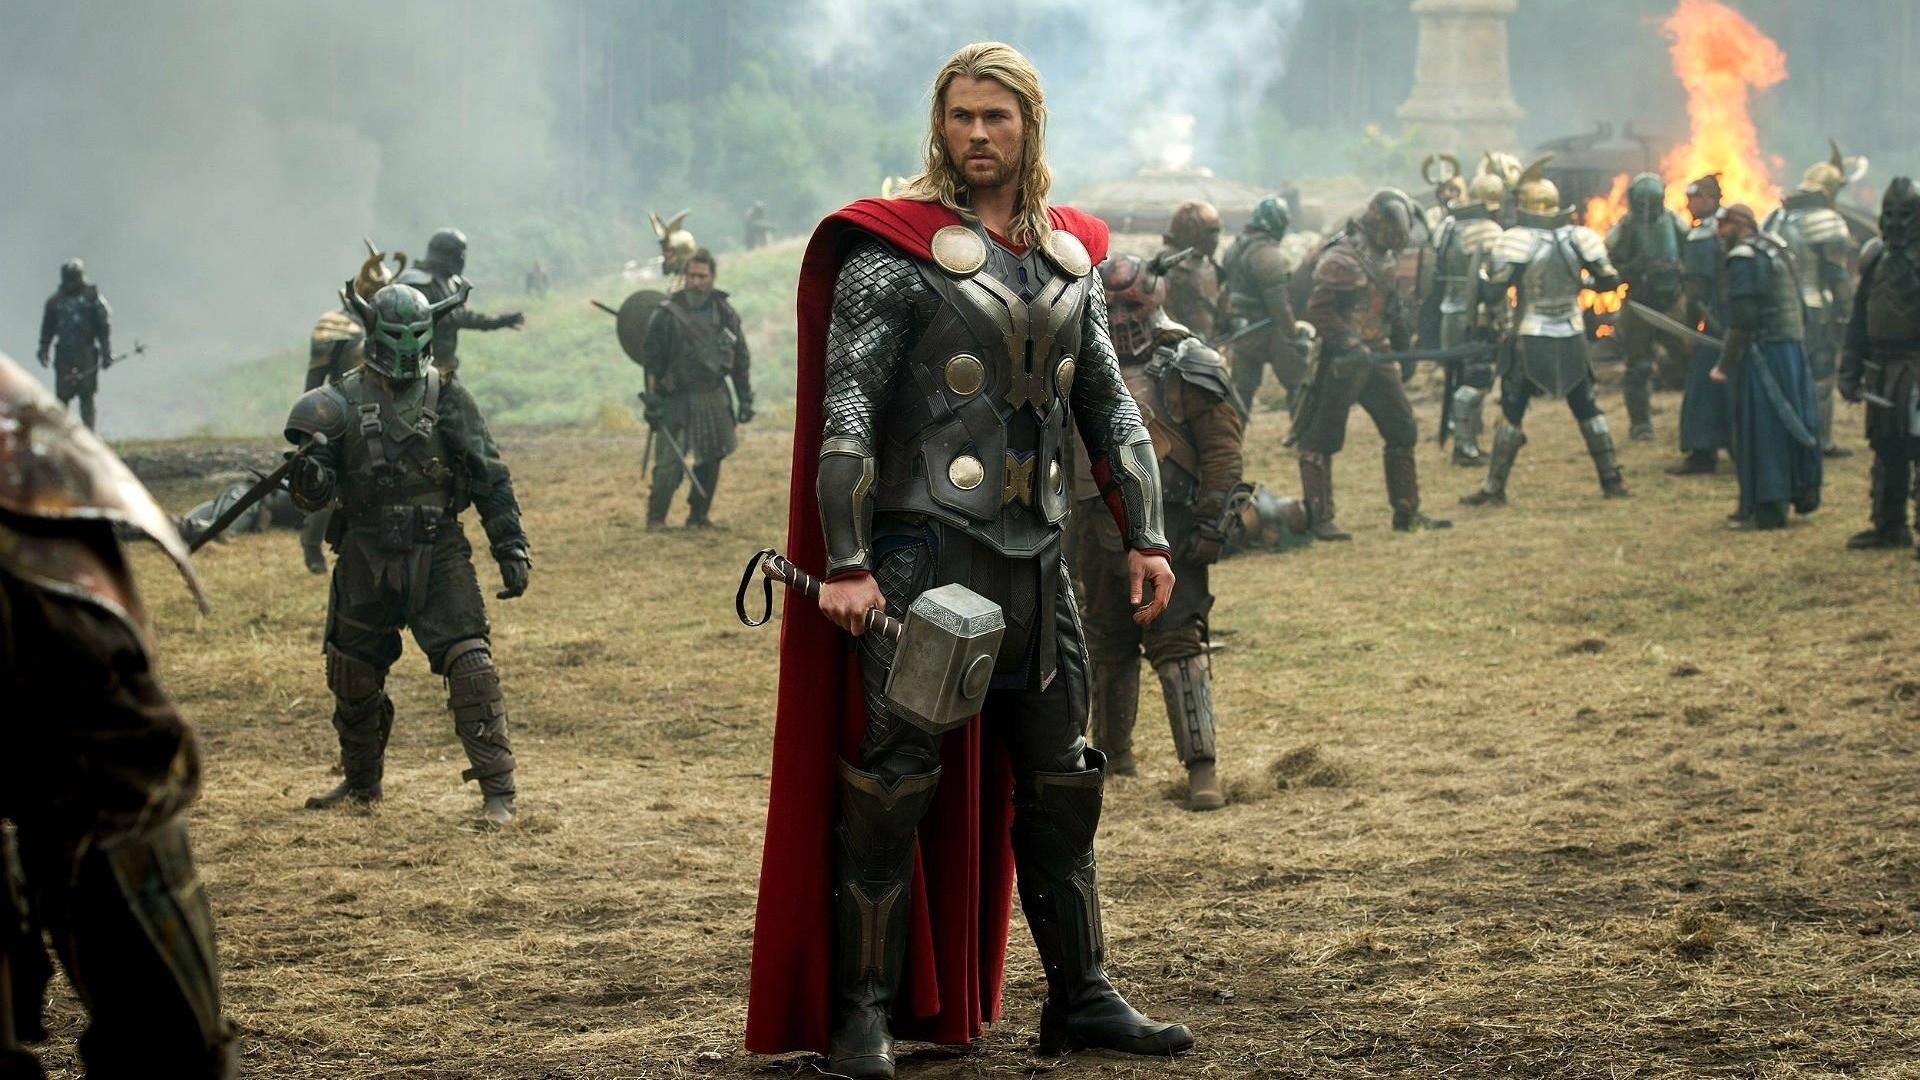 Wallpaper Soldier Person Thor 2 The Dark World Mjolnir Chris